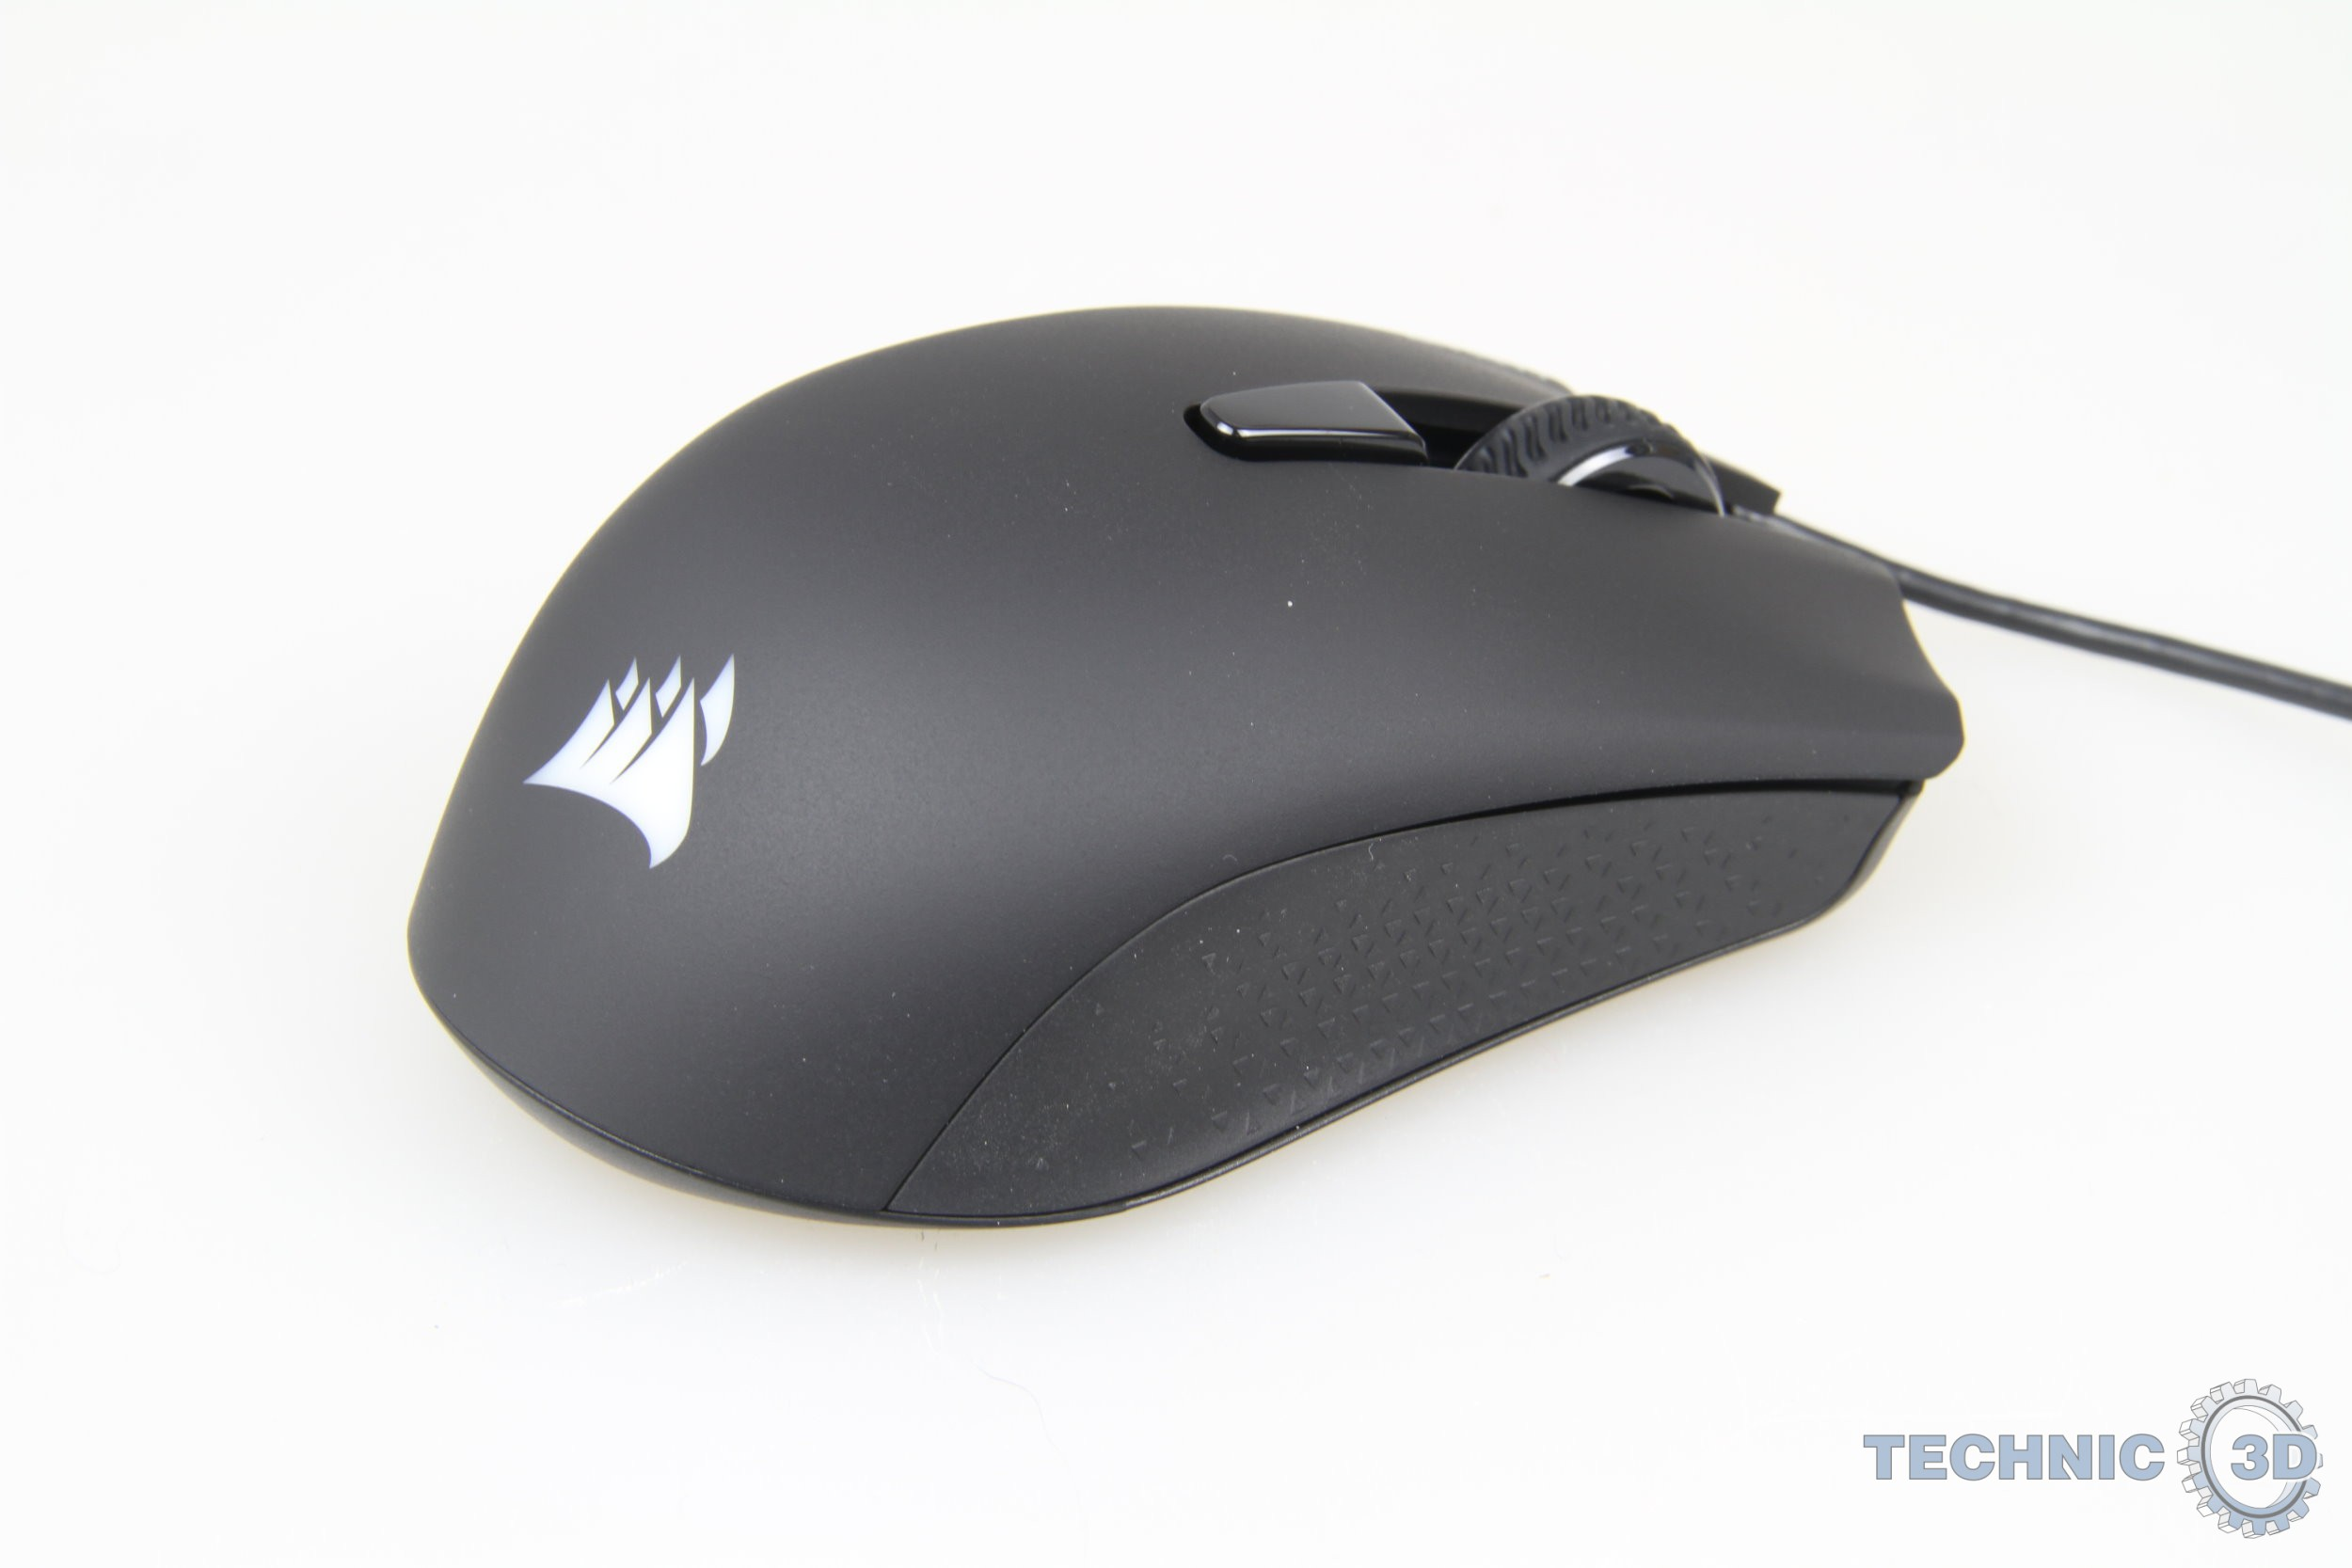 Corsair Harpoon RGB Gaming-Maus im Test | Review | Technic3D